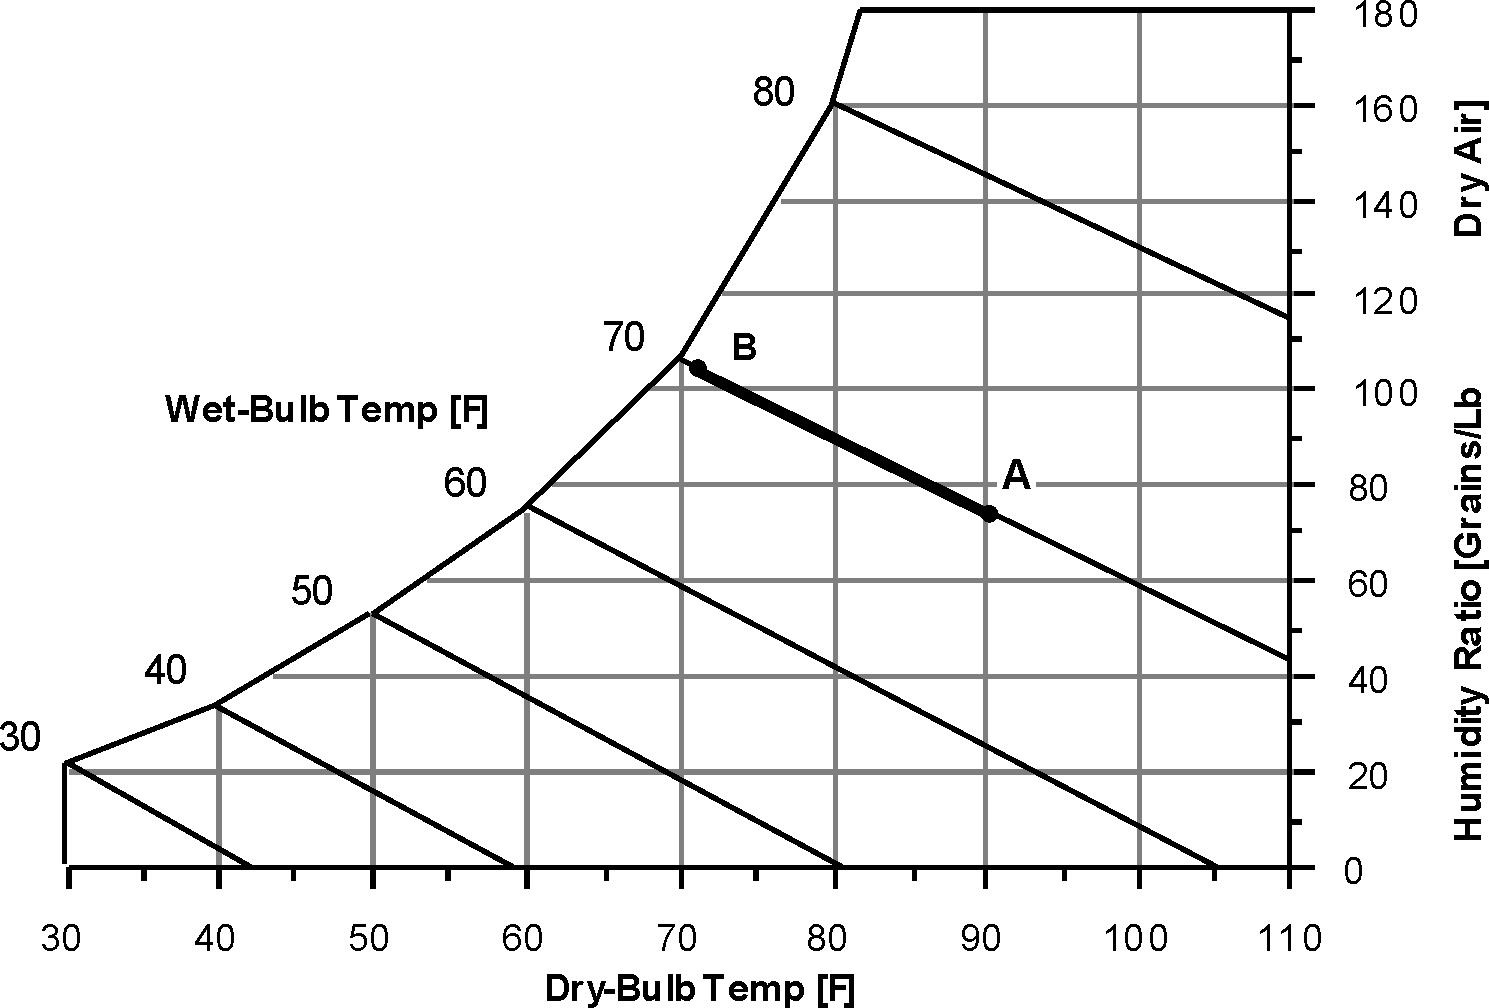 Evaporative Coolers : Engineering Reference — EnergyPlus 8.4